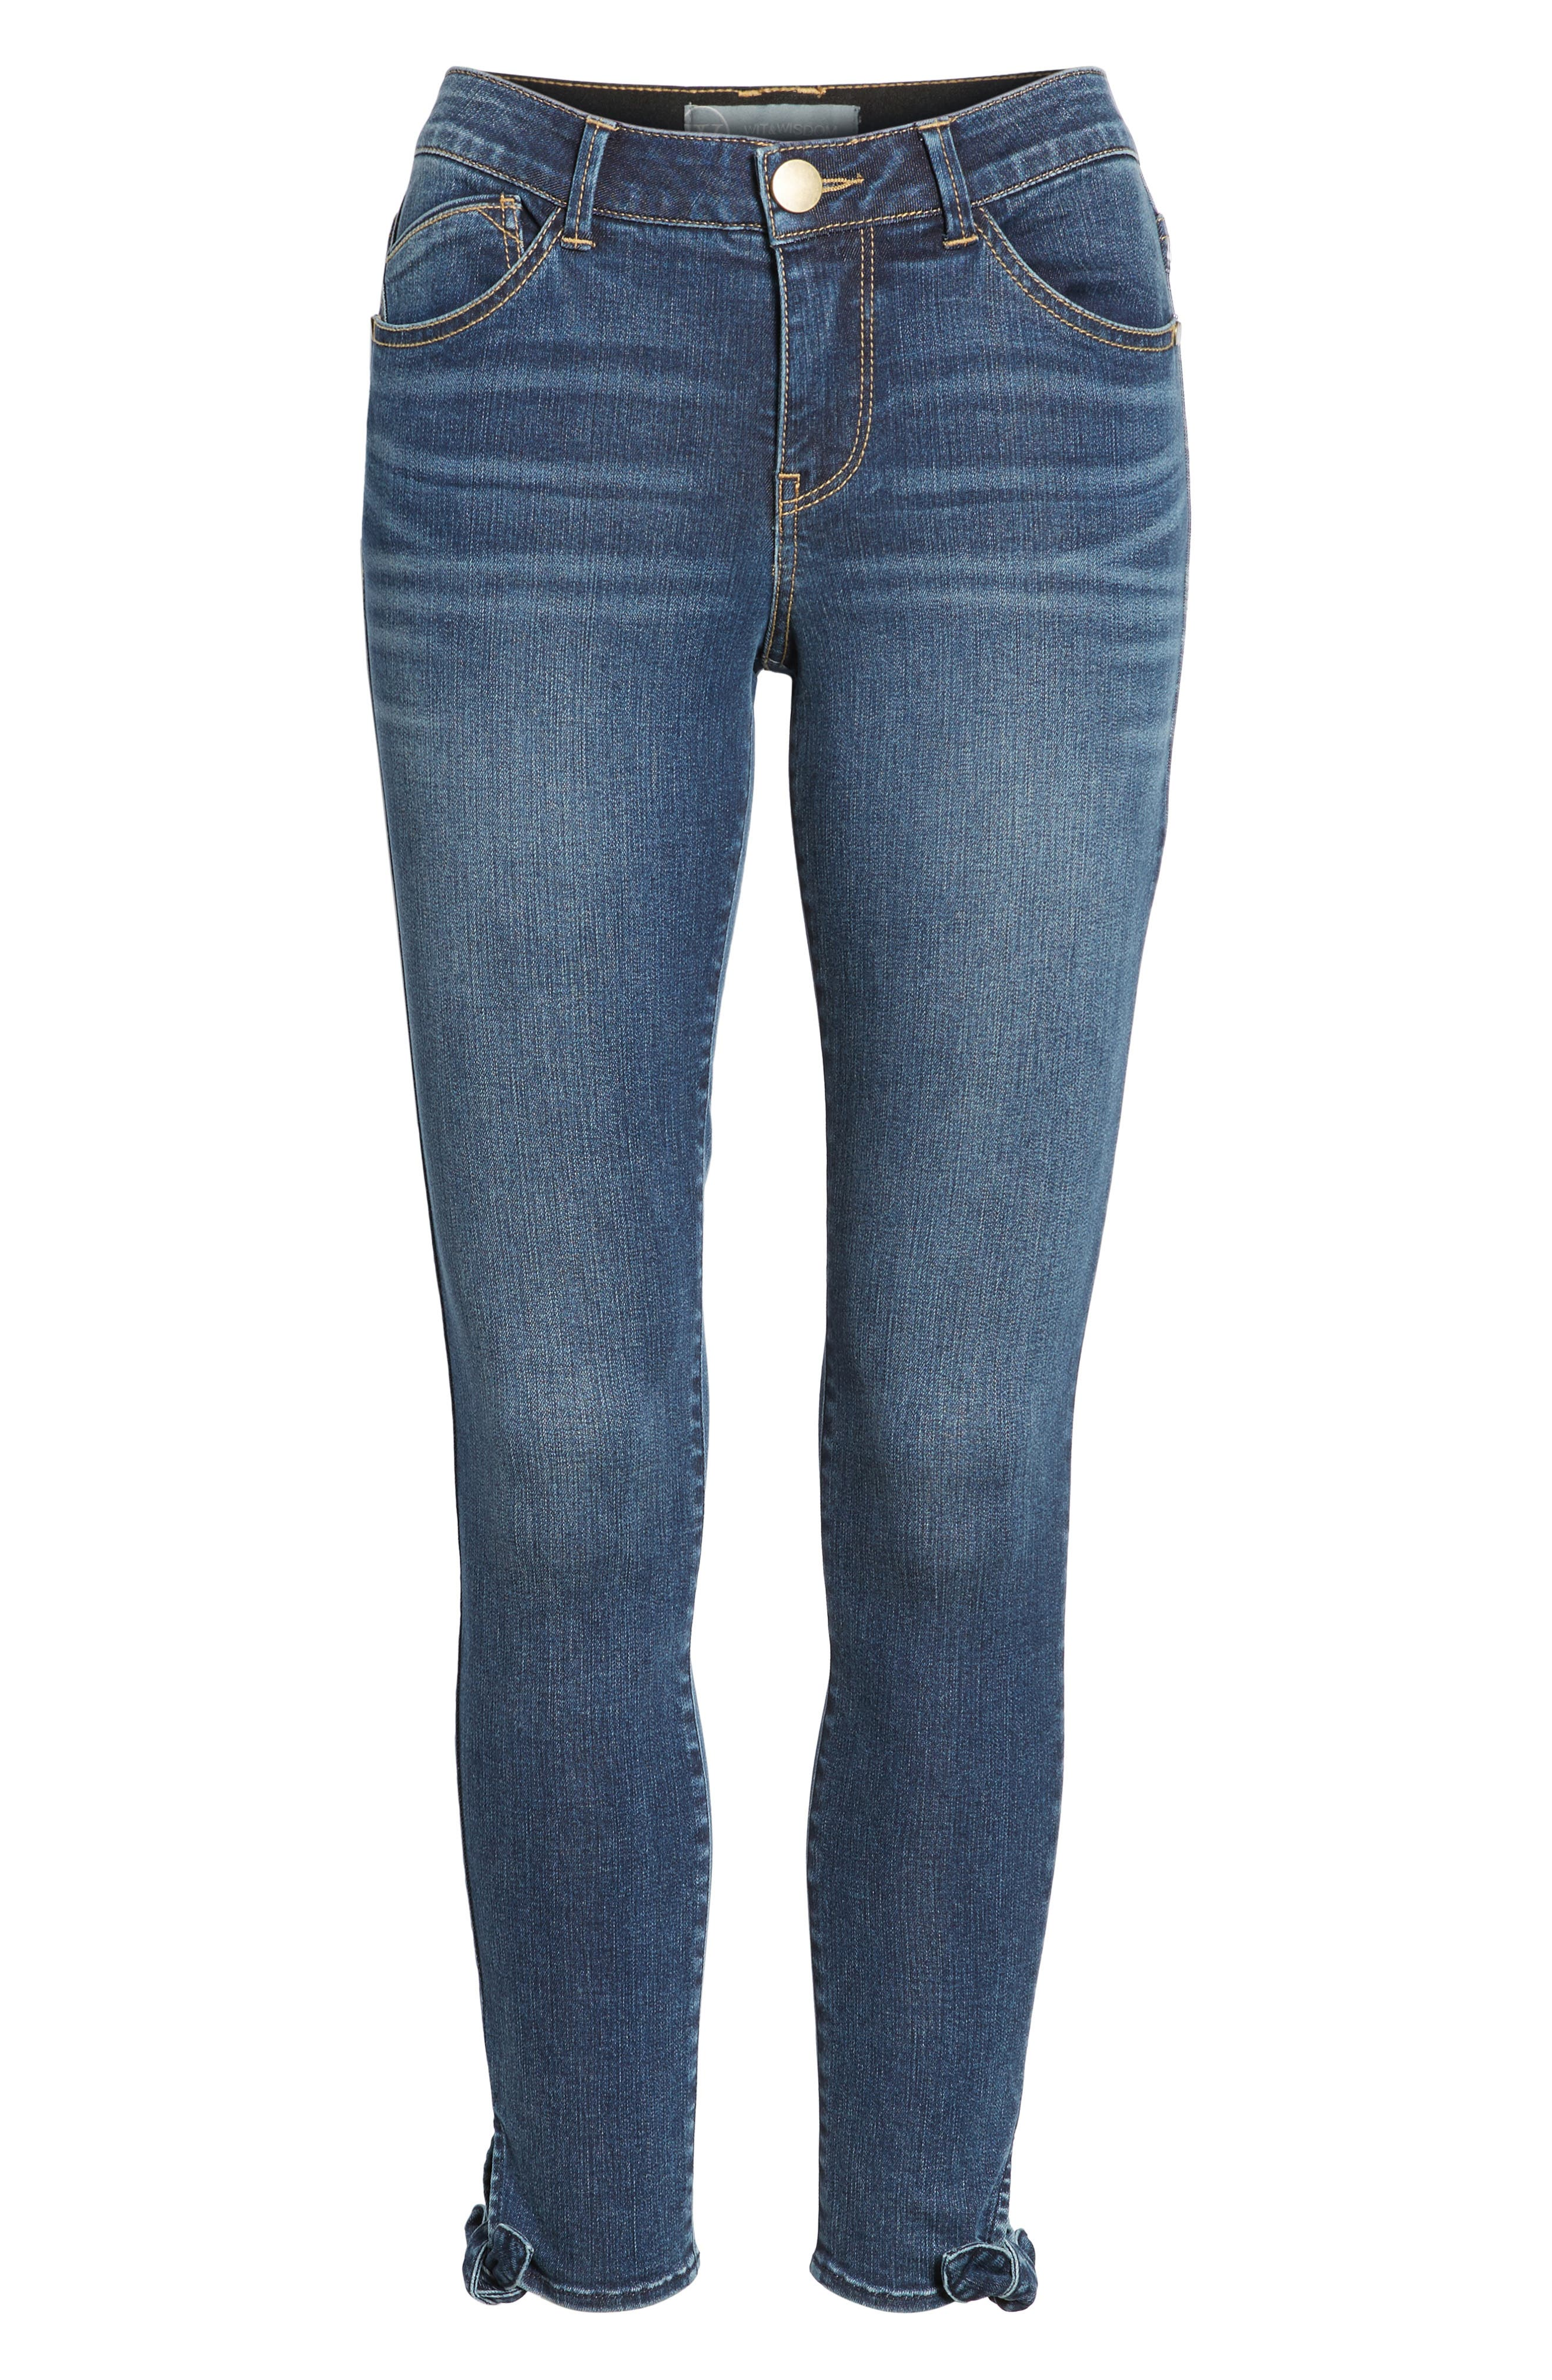 Ab-solution Ankle Skinny Skimmer Jeans,                             Alternate thumbnail 6, color,                             Bl- Blue